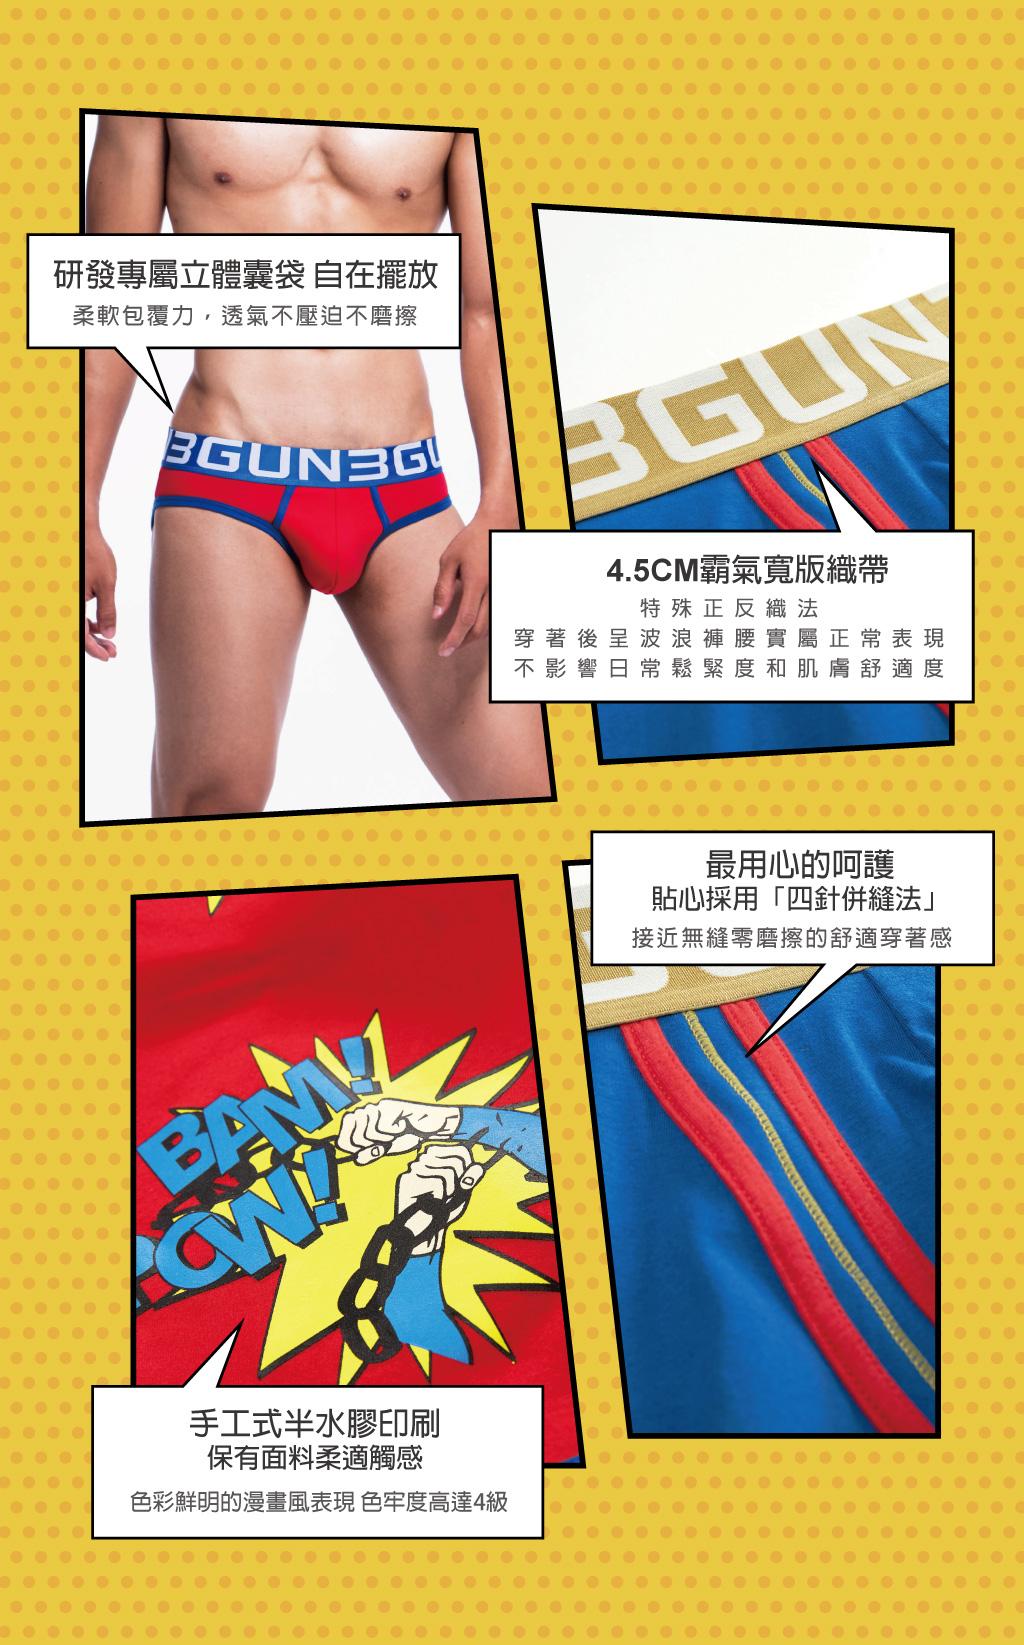 3GUN  男性時尚內衣褲MIT品牌-棉感-英雄印花男彈力棉三角褲組